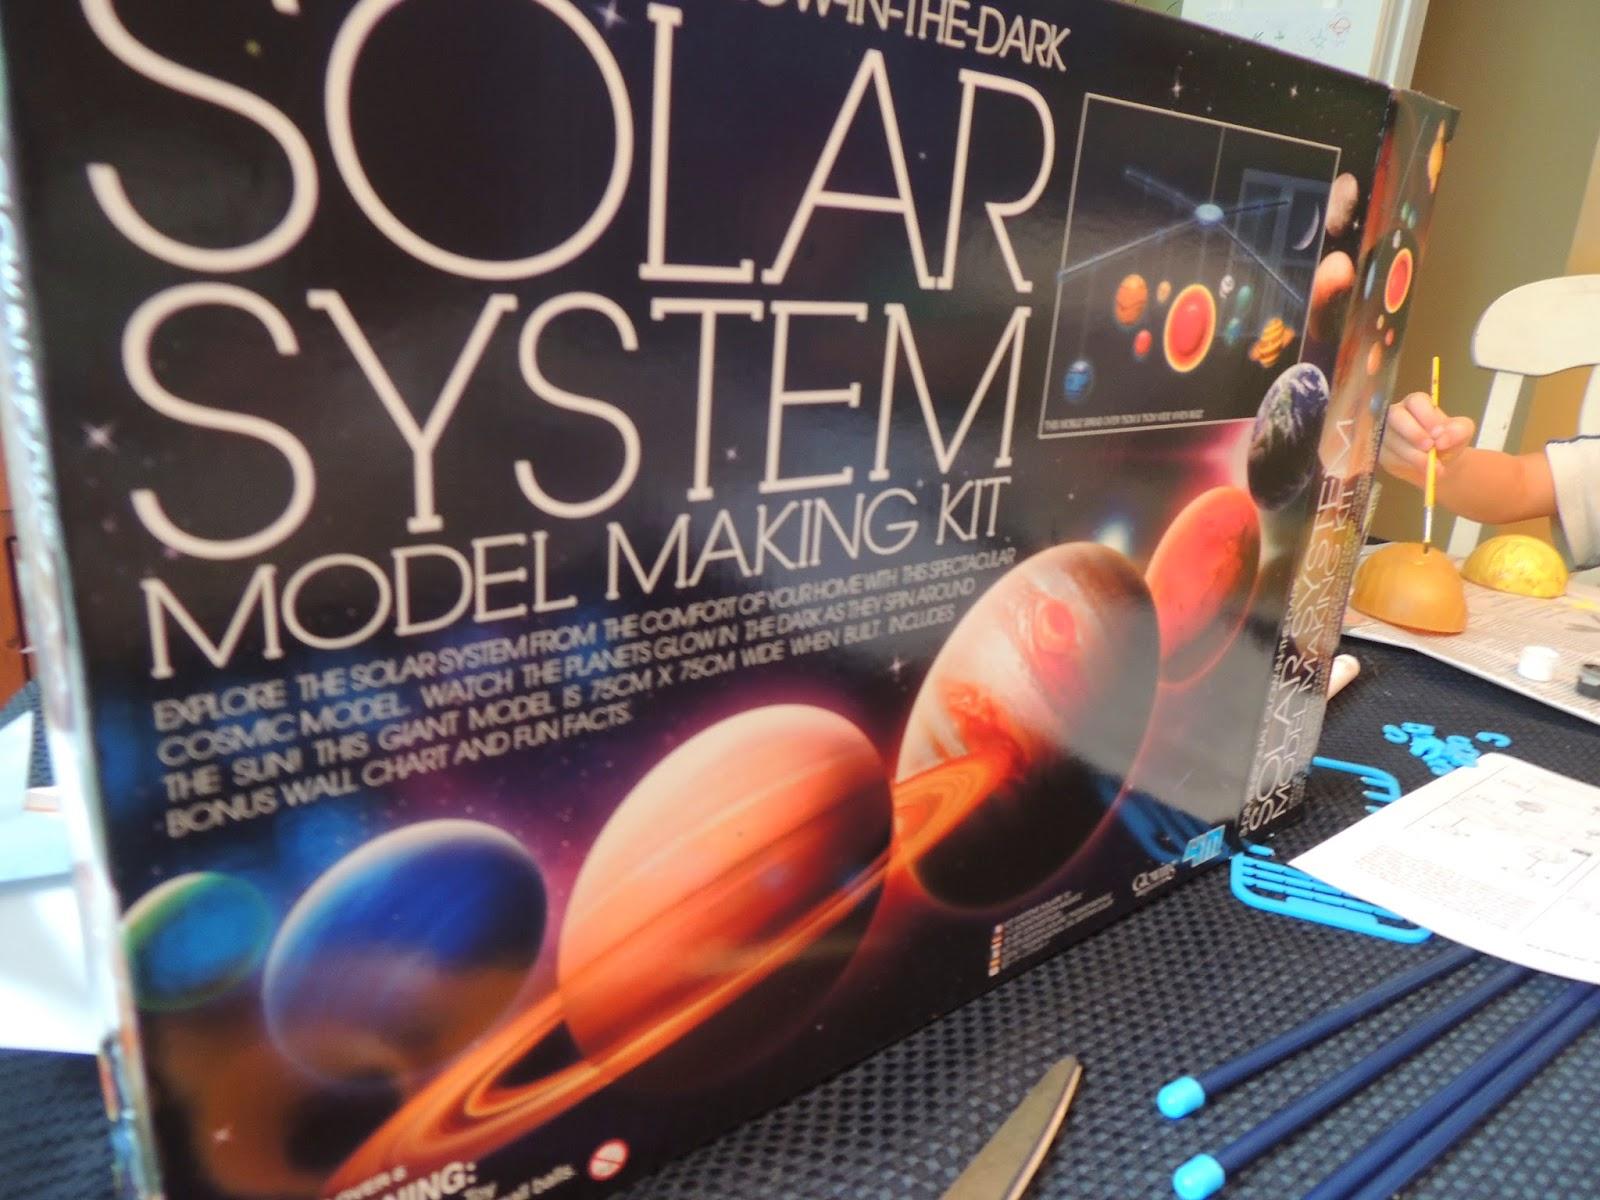 http://www.amazon.com/4M-5219-solar-system-kit/dp/B00007L12U/ref=sr_1_4?s=toys-and-games&ie=UTF8&qid=1407193785&sr=1-4&keywords=solar+system+mobile